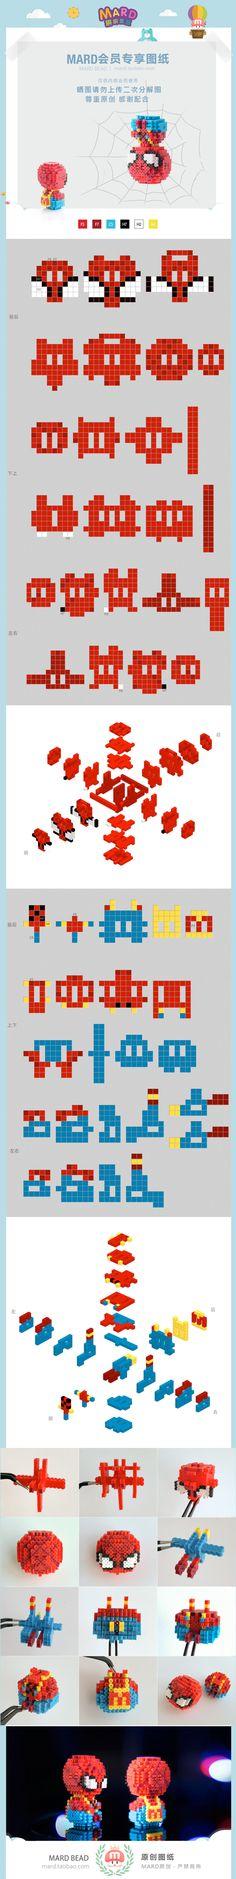 Hamma Beads 3d, Hamma Beads Ideas, Fuse Beads, Perler Bead Disney, Diy Perler Beads, Perler Bead Art, Easy Perler Bead Patterns, Perler Bead Templates, Hama Beads Kawaii